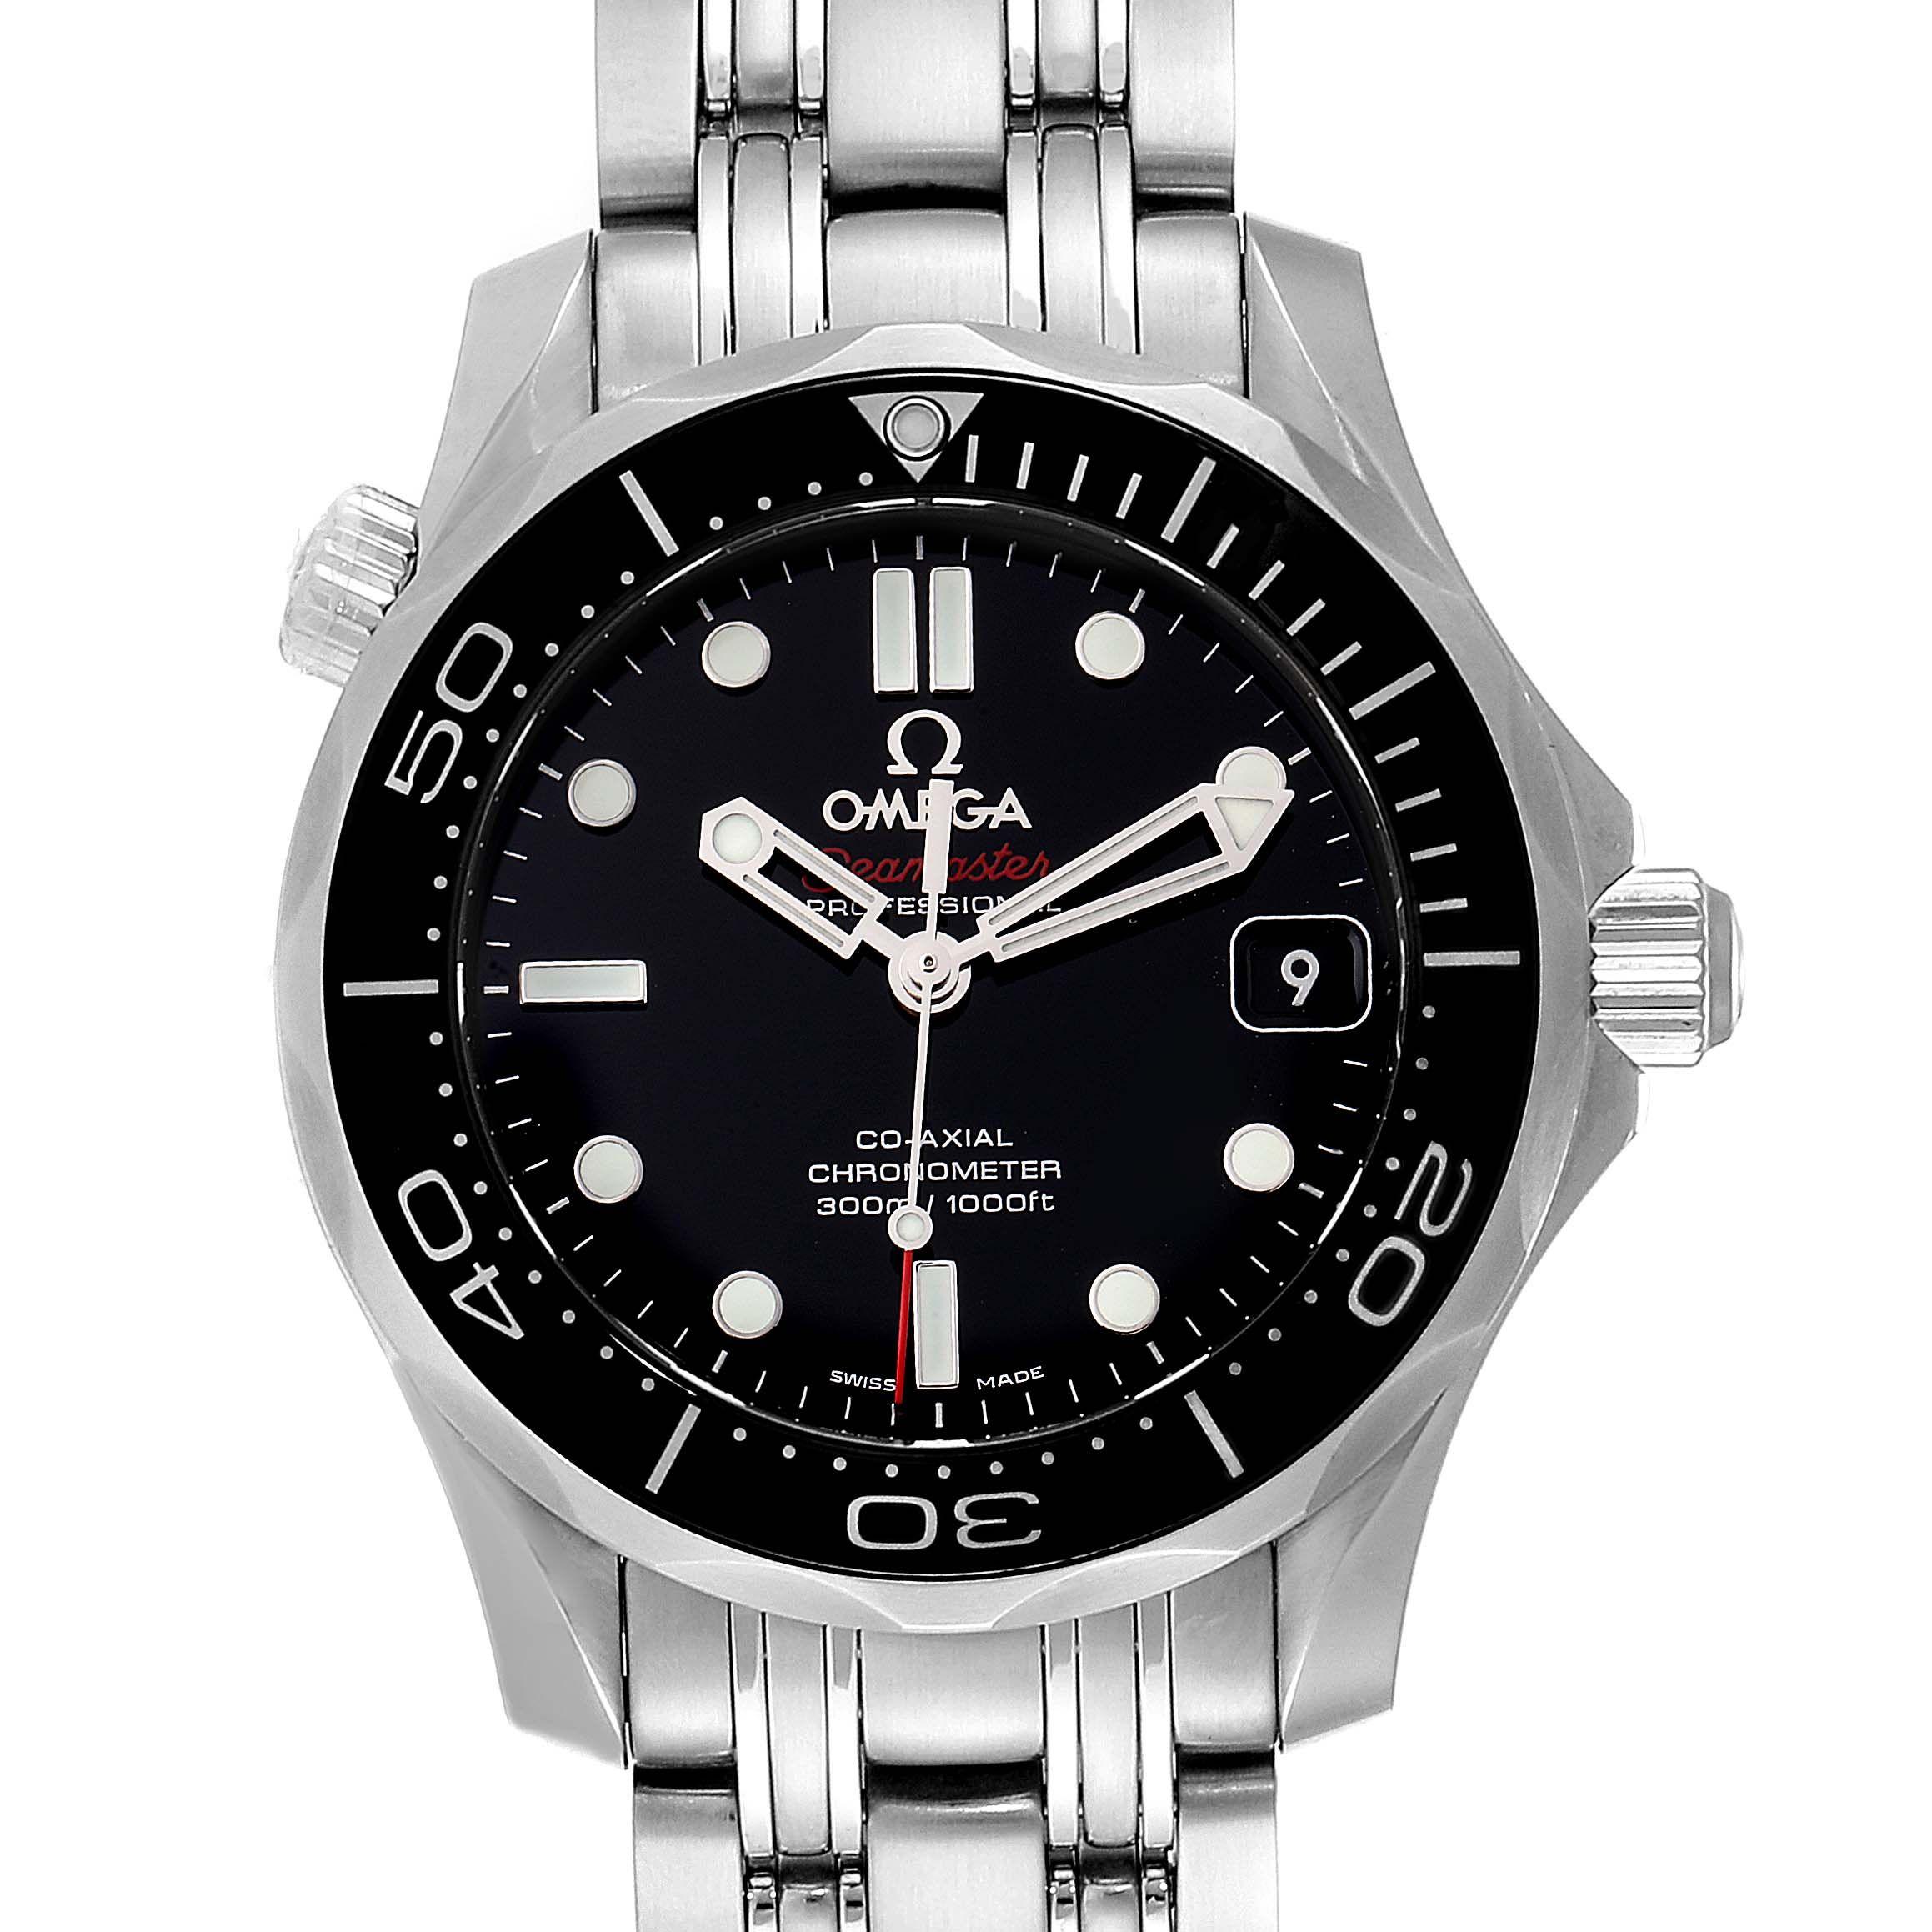 Omega Seamaster 300M Midsize 36mm Watch 212.30.36.20.01